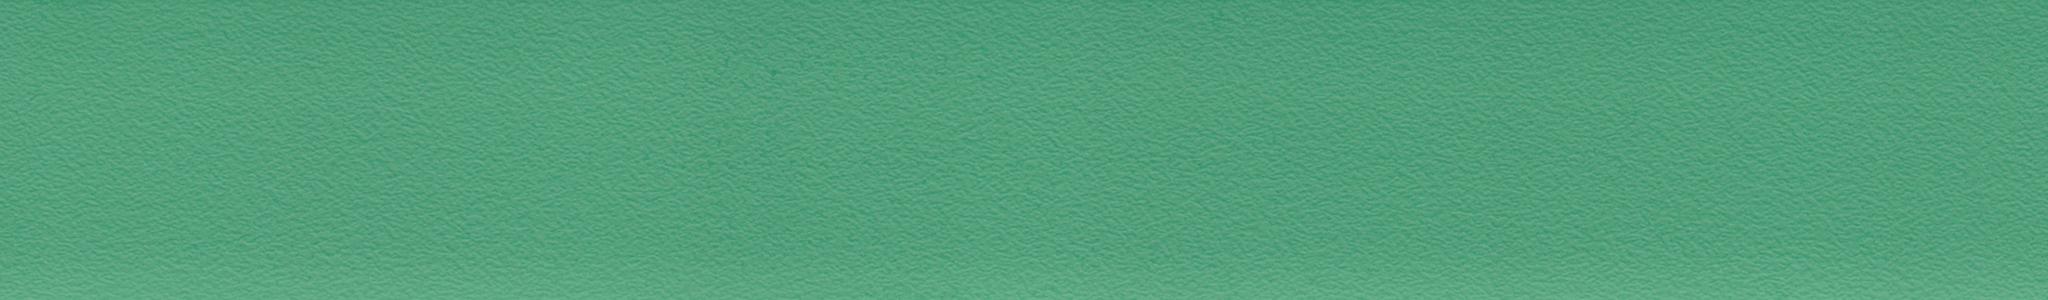 HU 16655 ABS hrana zelená perla XG